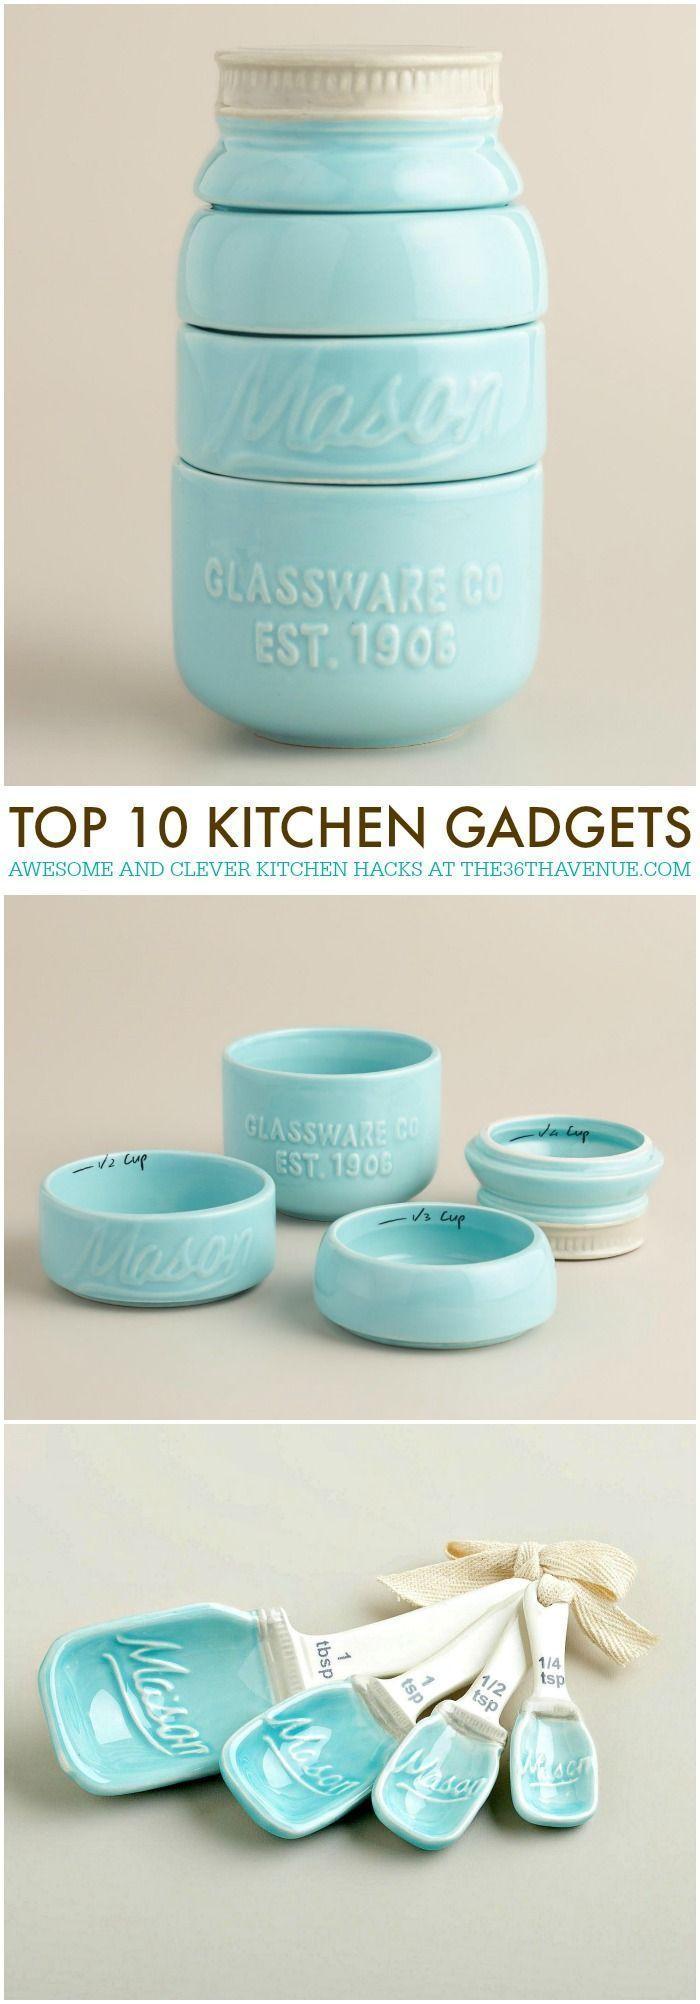 17 best 가구 디자인 images on Pinterest | Cafe design, Cooking ware ...